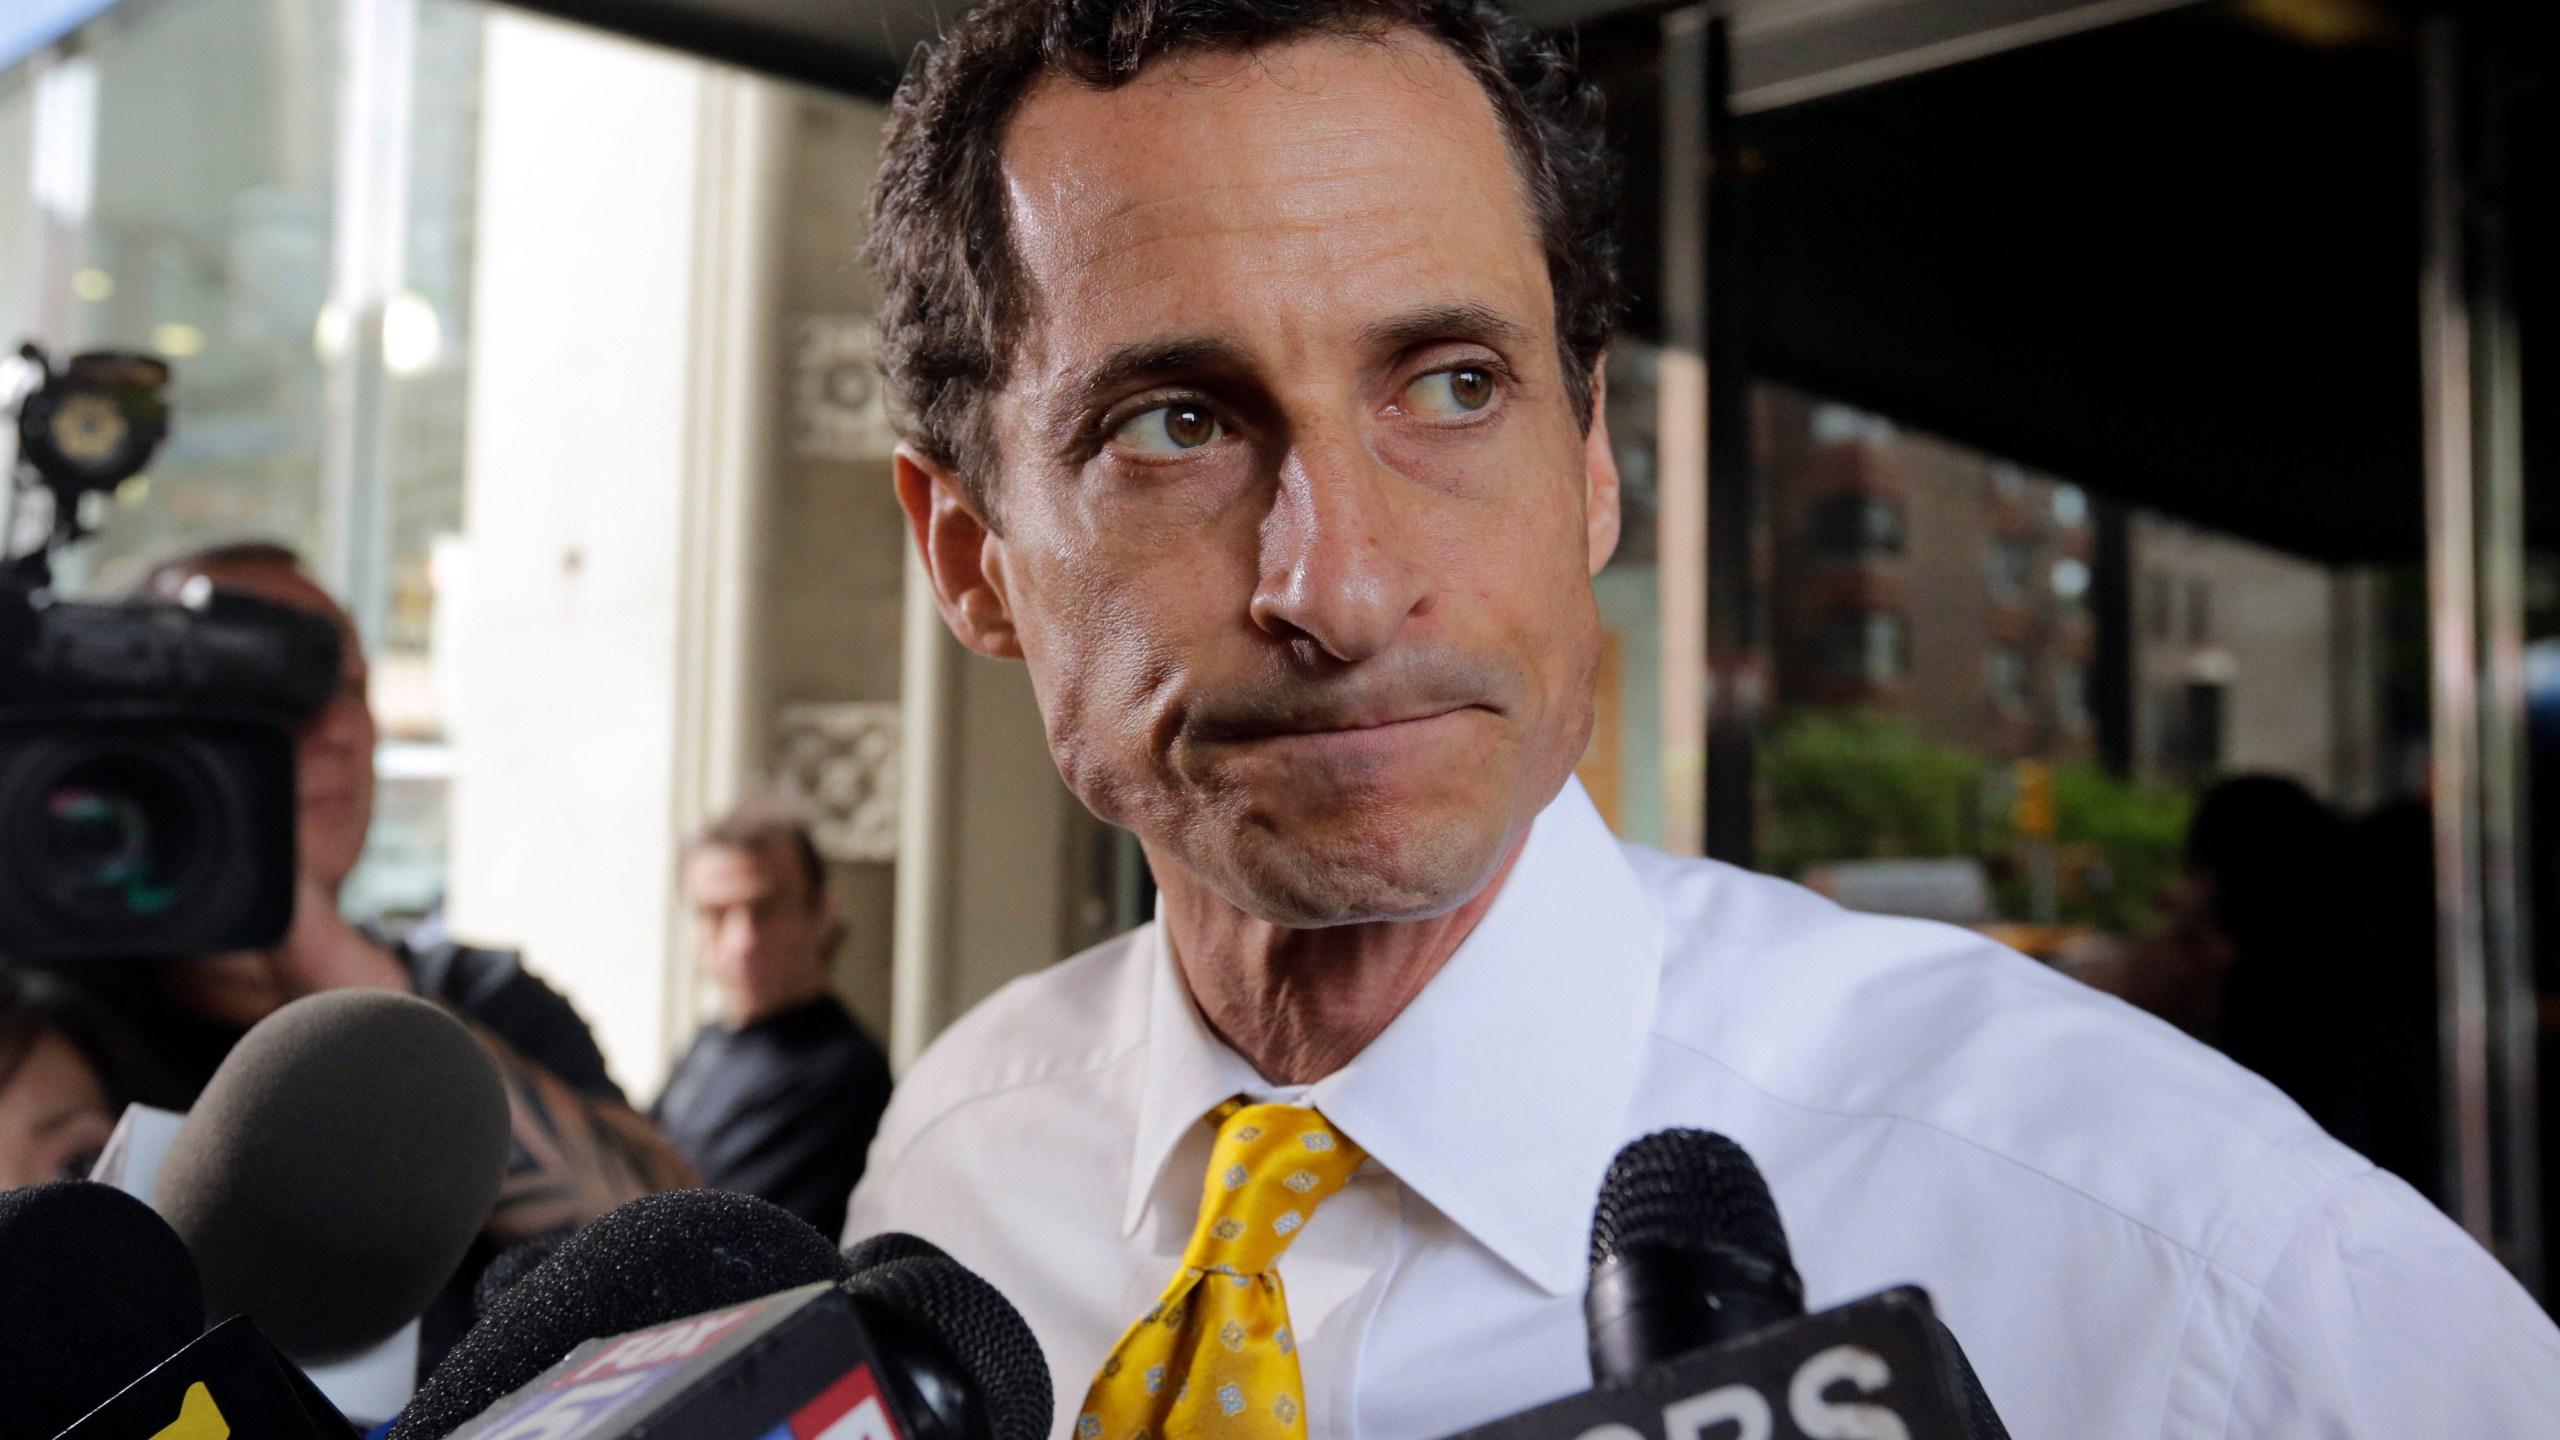 Anthony Weiner Photo by Richard Drew, AP Photo_330173